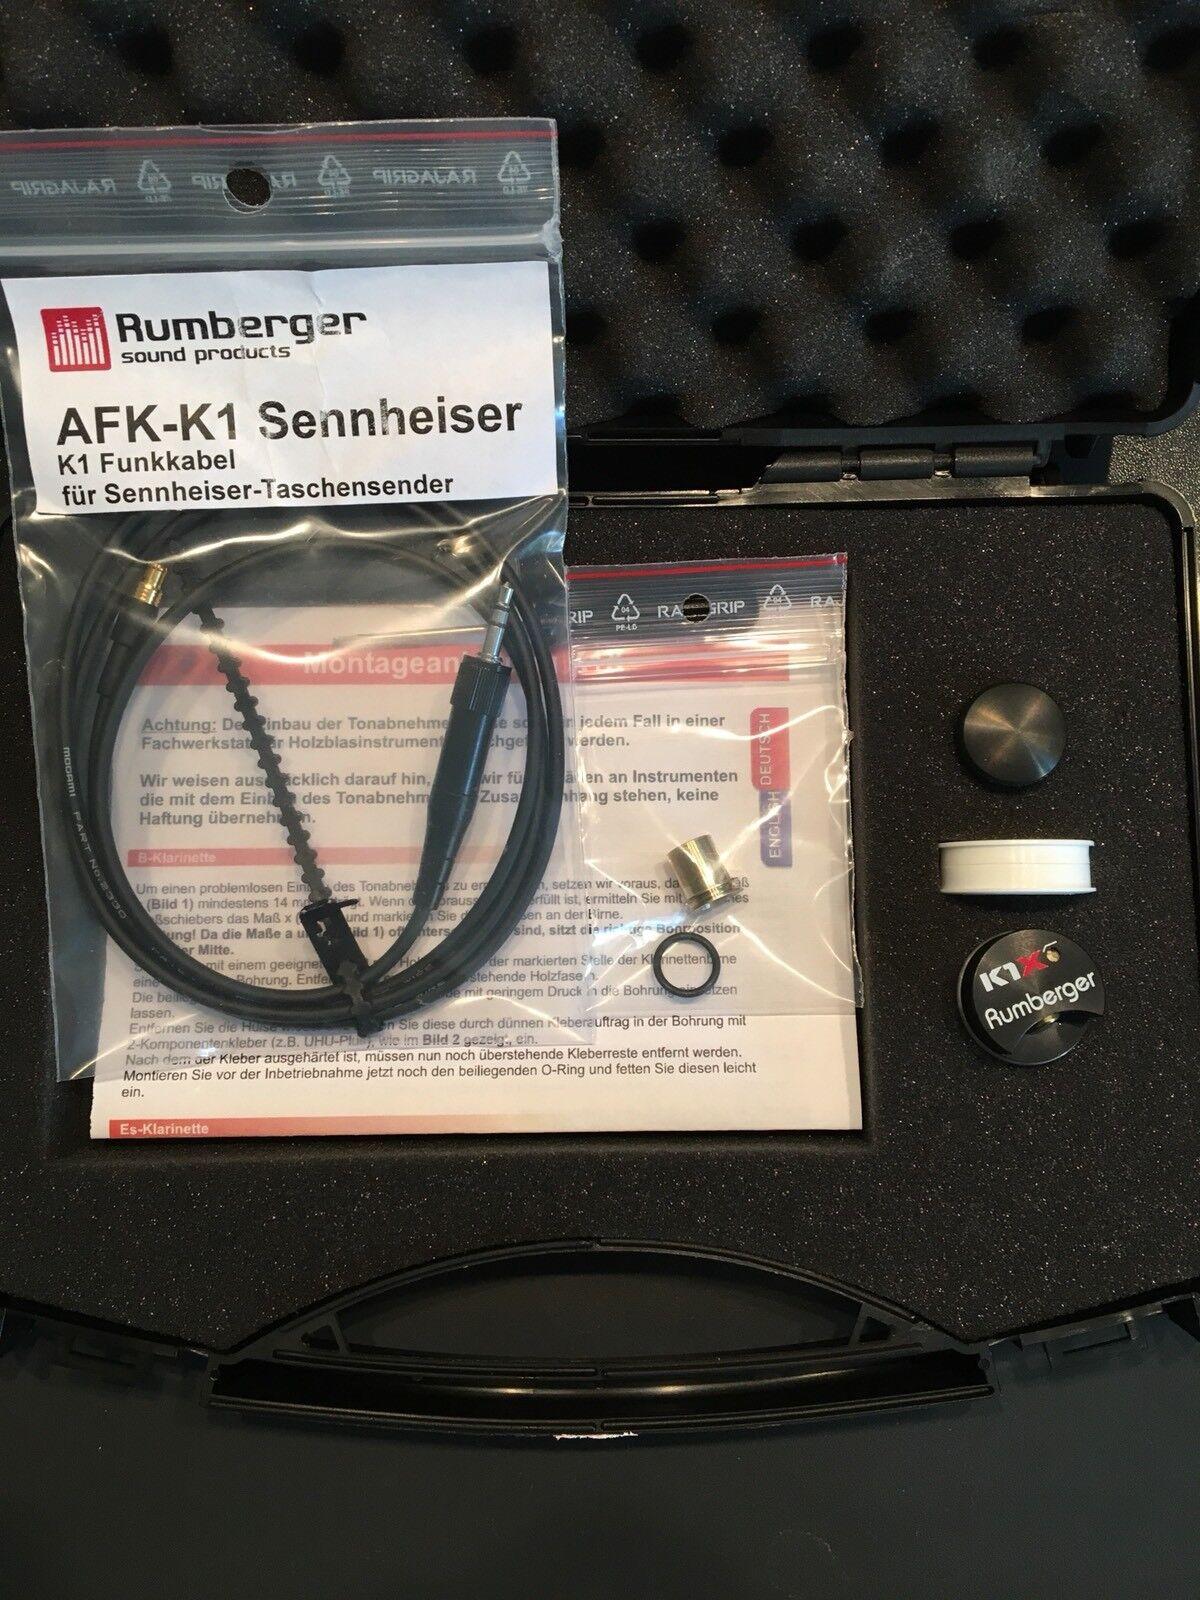 B,A,G Klarinette & Saxofon Rumberger K1X + Sennheiser Neu  2 Jahre Garantie